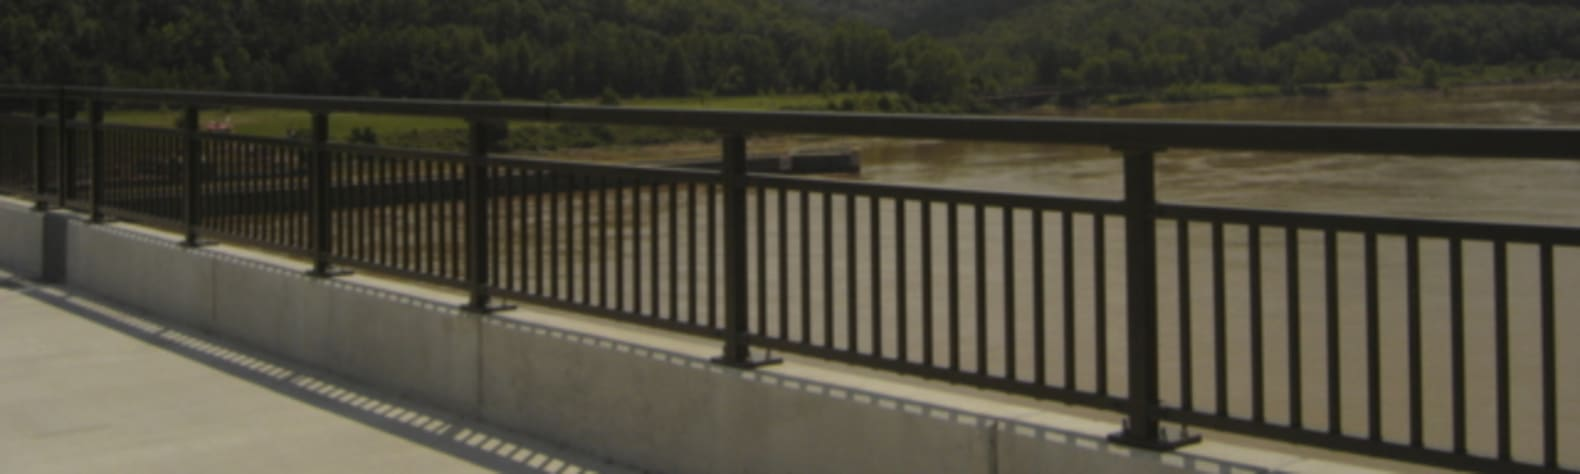 Arkansas River - Murray Lock and Dam